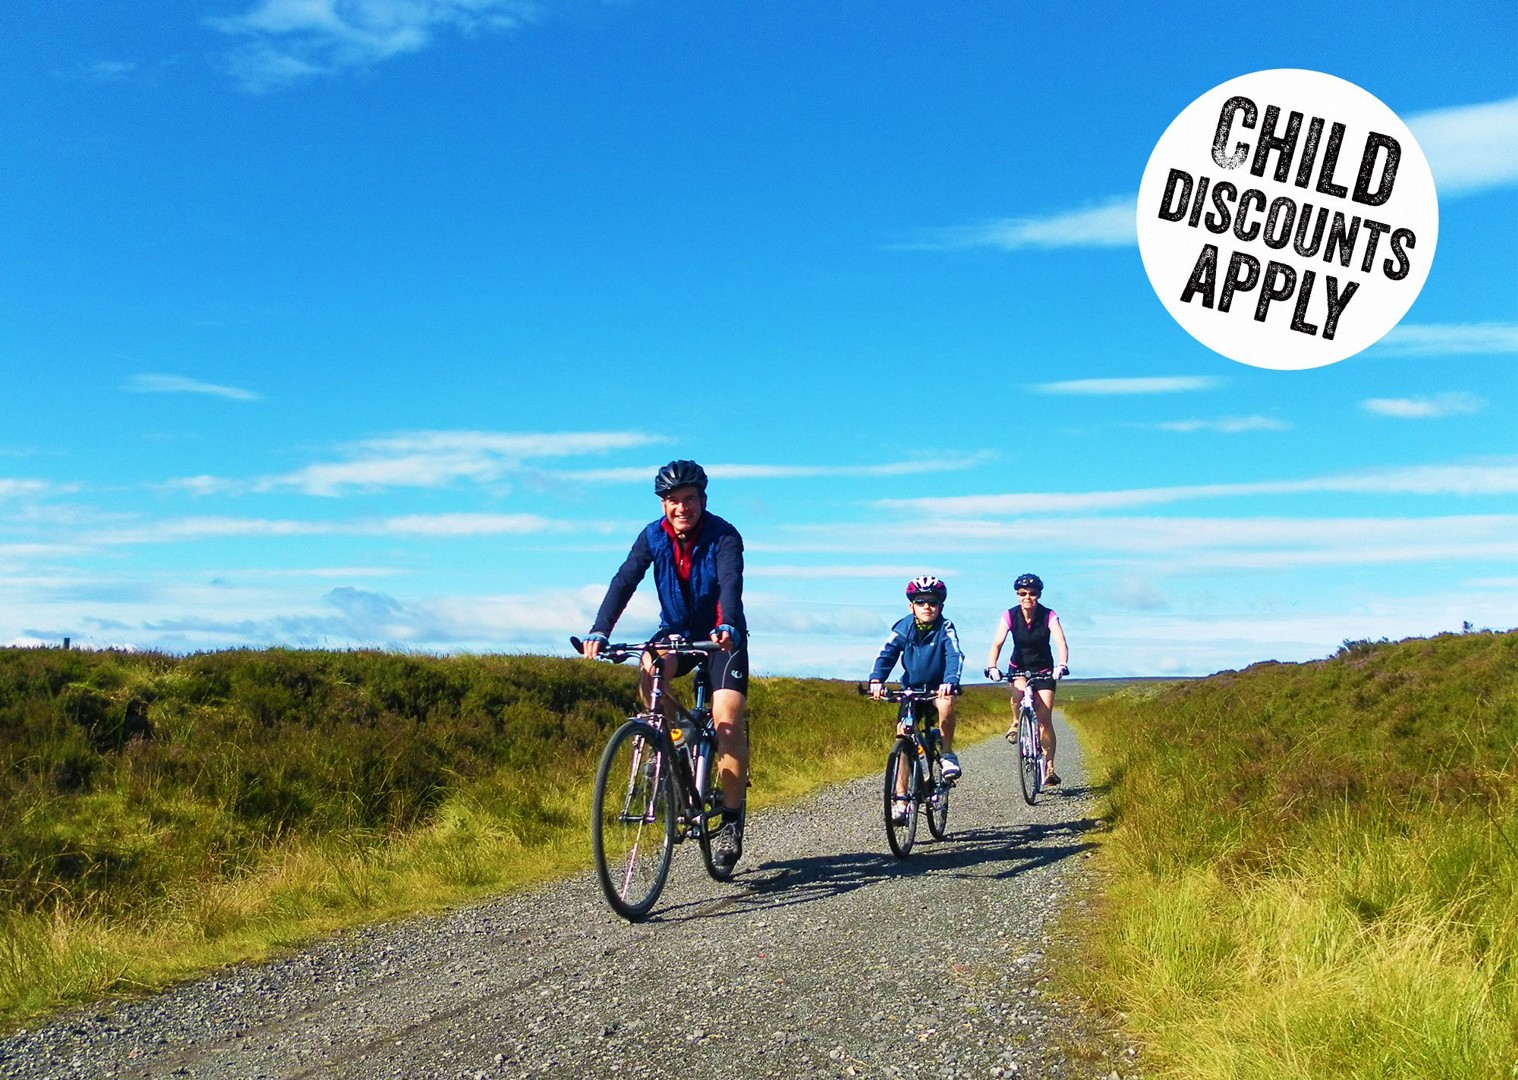 Coast to Coast 5 Days Cycling.jpg - UK - C2C - Coast to Coast 5 Days Cycling - Self-Guided Family Cycling Holiday - Family Cycling